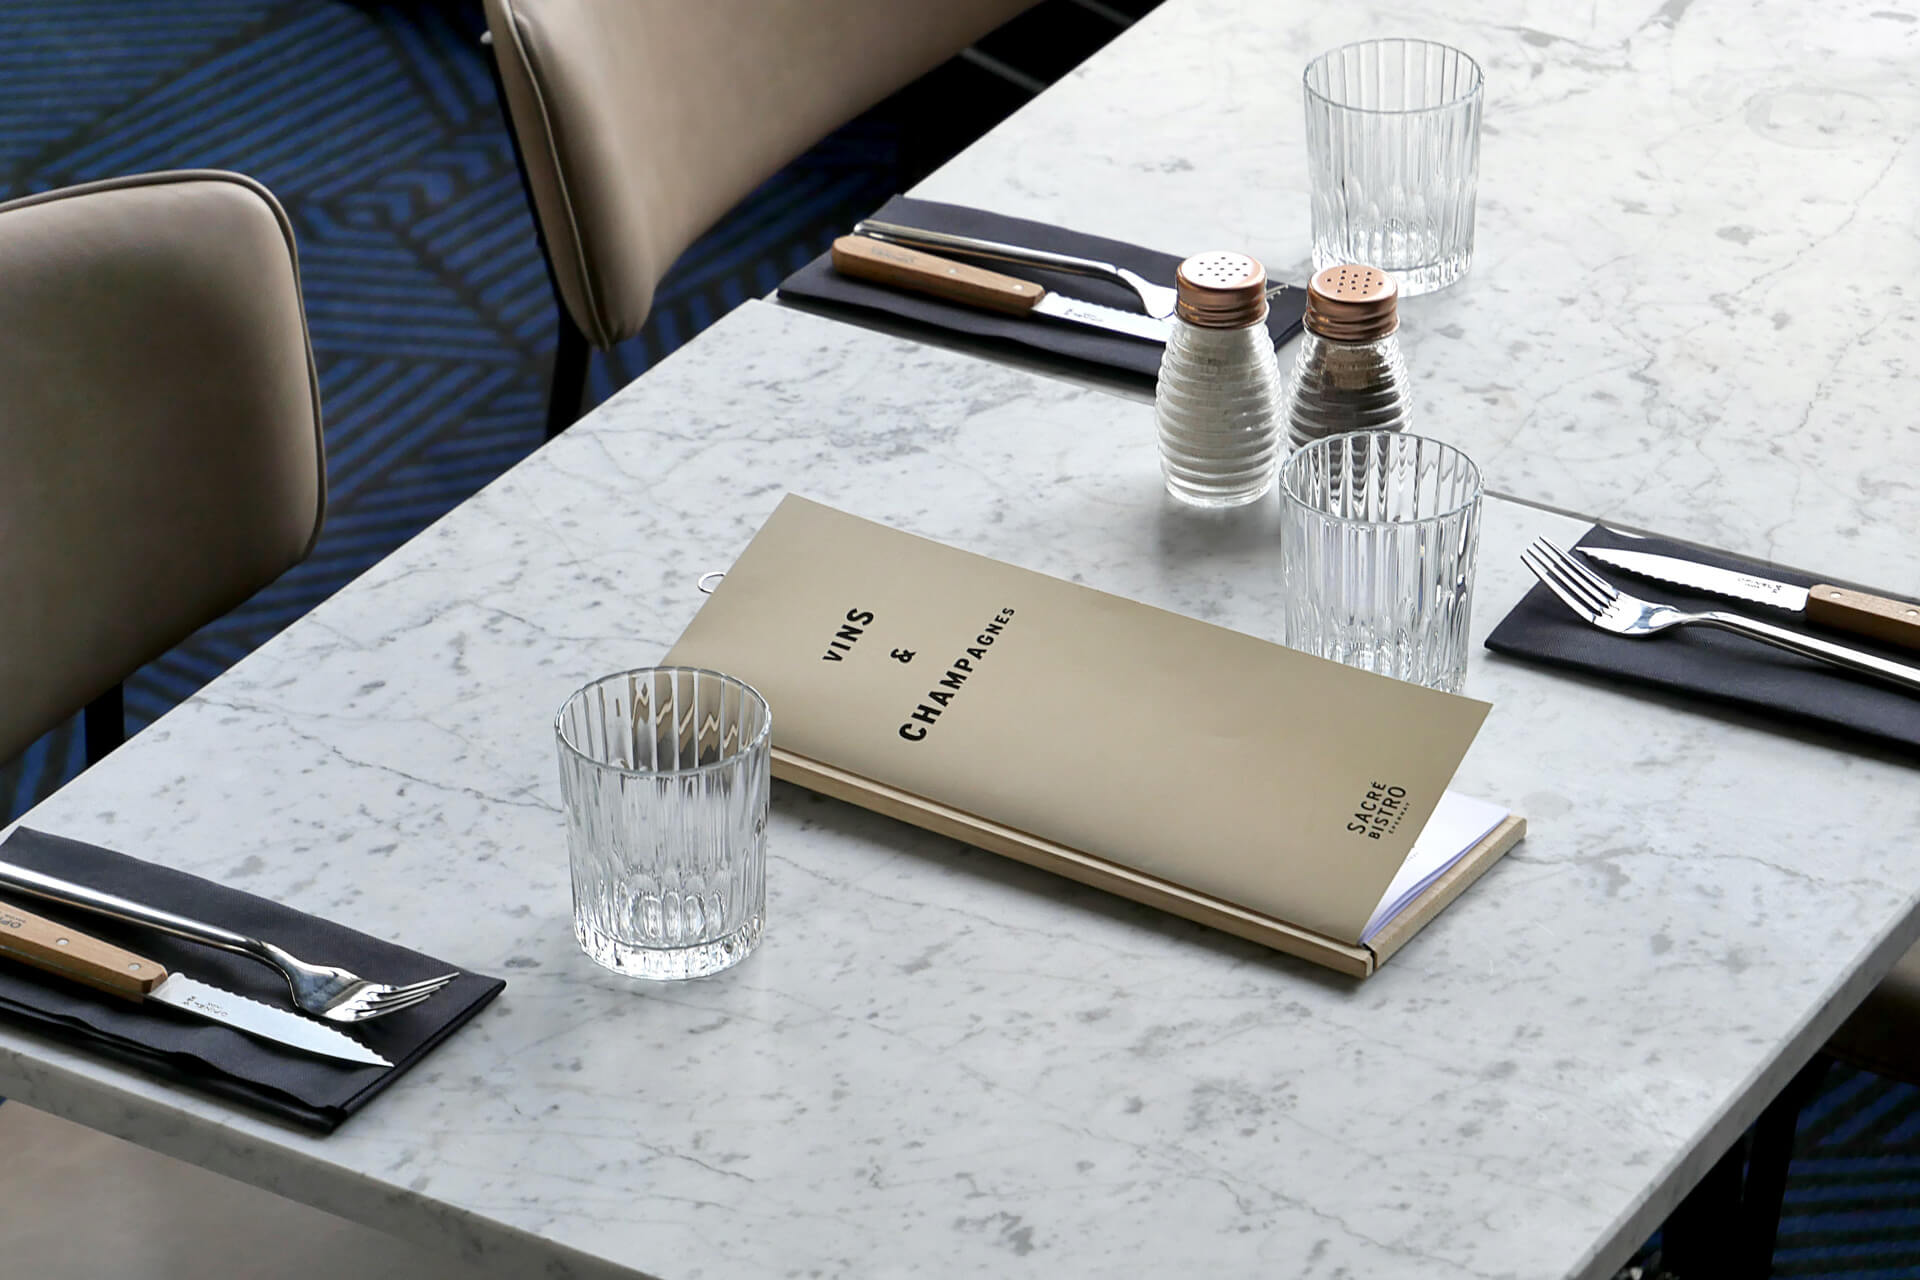 sacre-bistro-plastac-menu-01